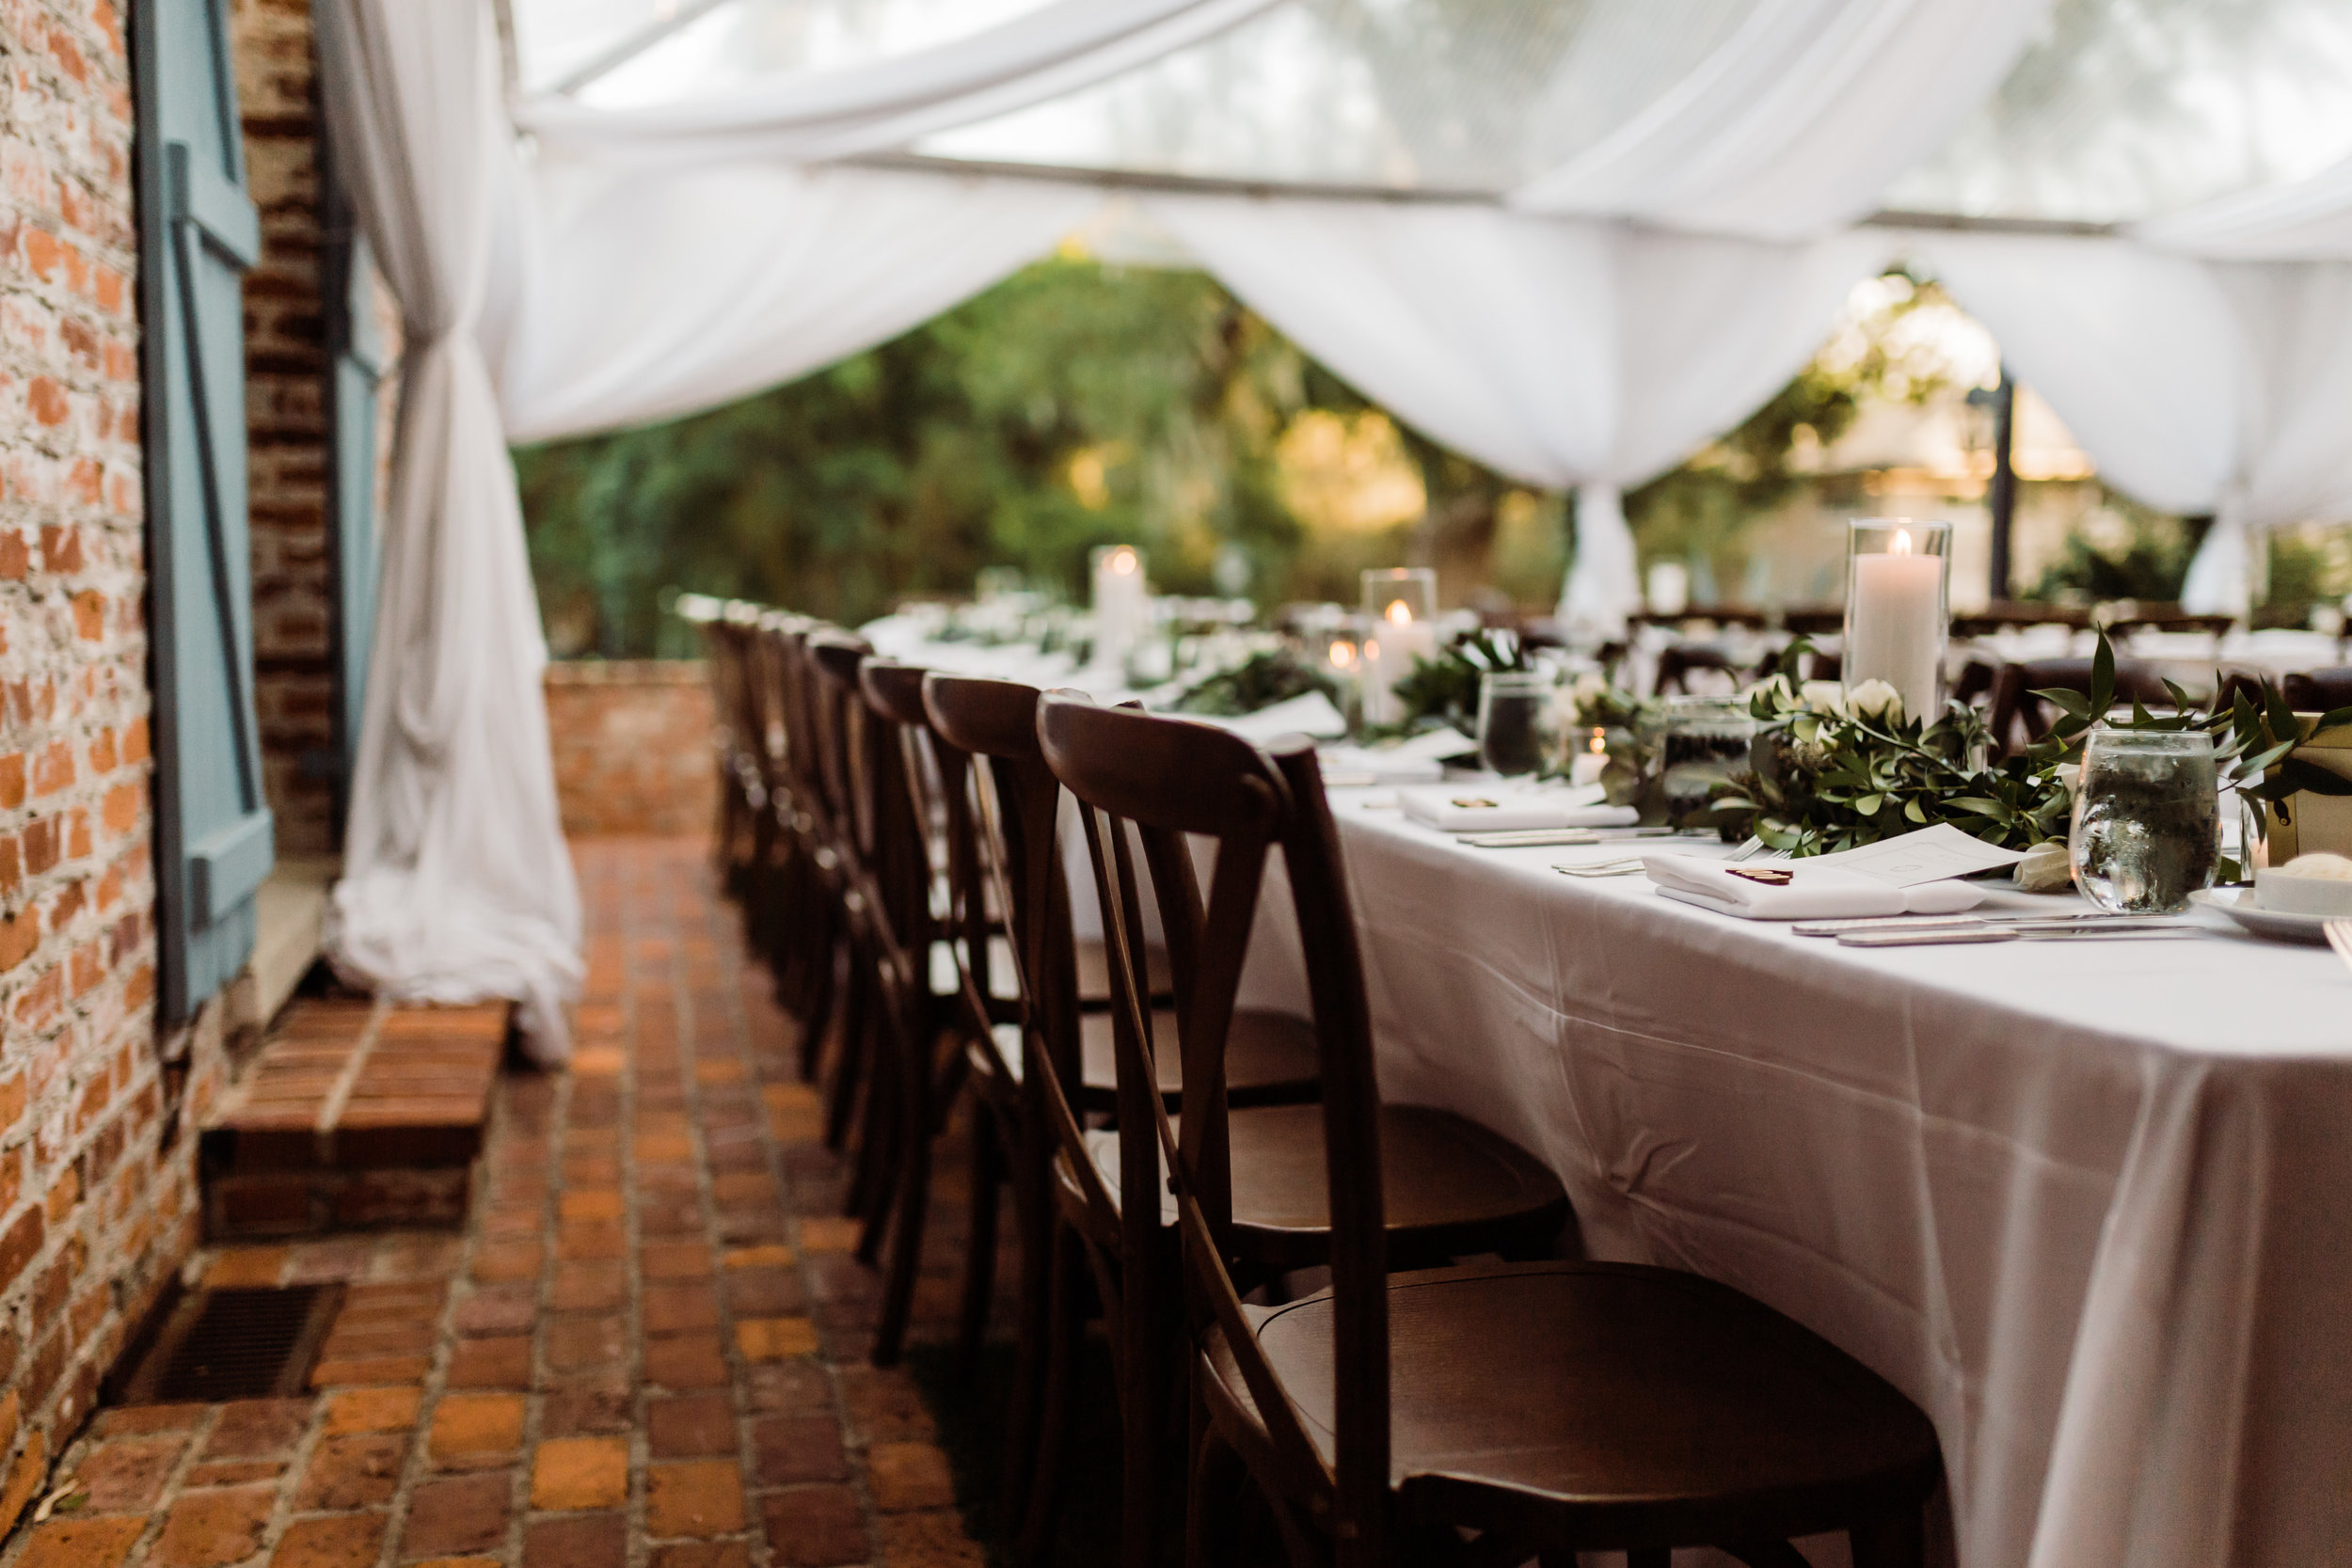 2017.10.15 Steffi and Elliott Simmonds Casa Feliz Wedding (653 of 969).jpg